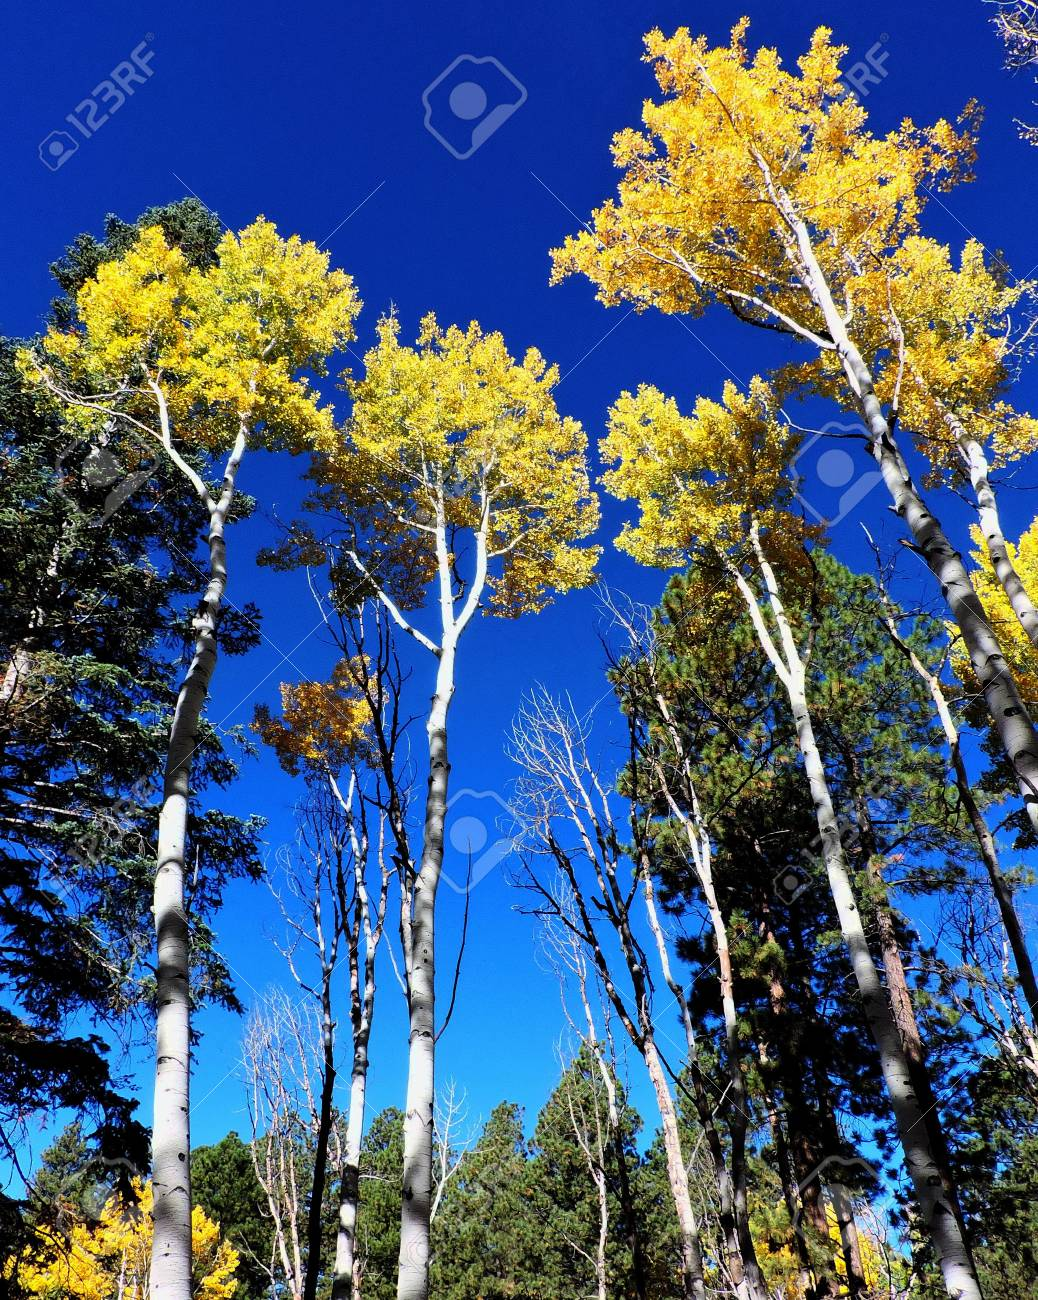 Aspen Leaves Trees Forest Autumn Stock Photo - 56978304